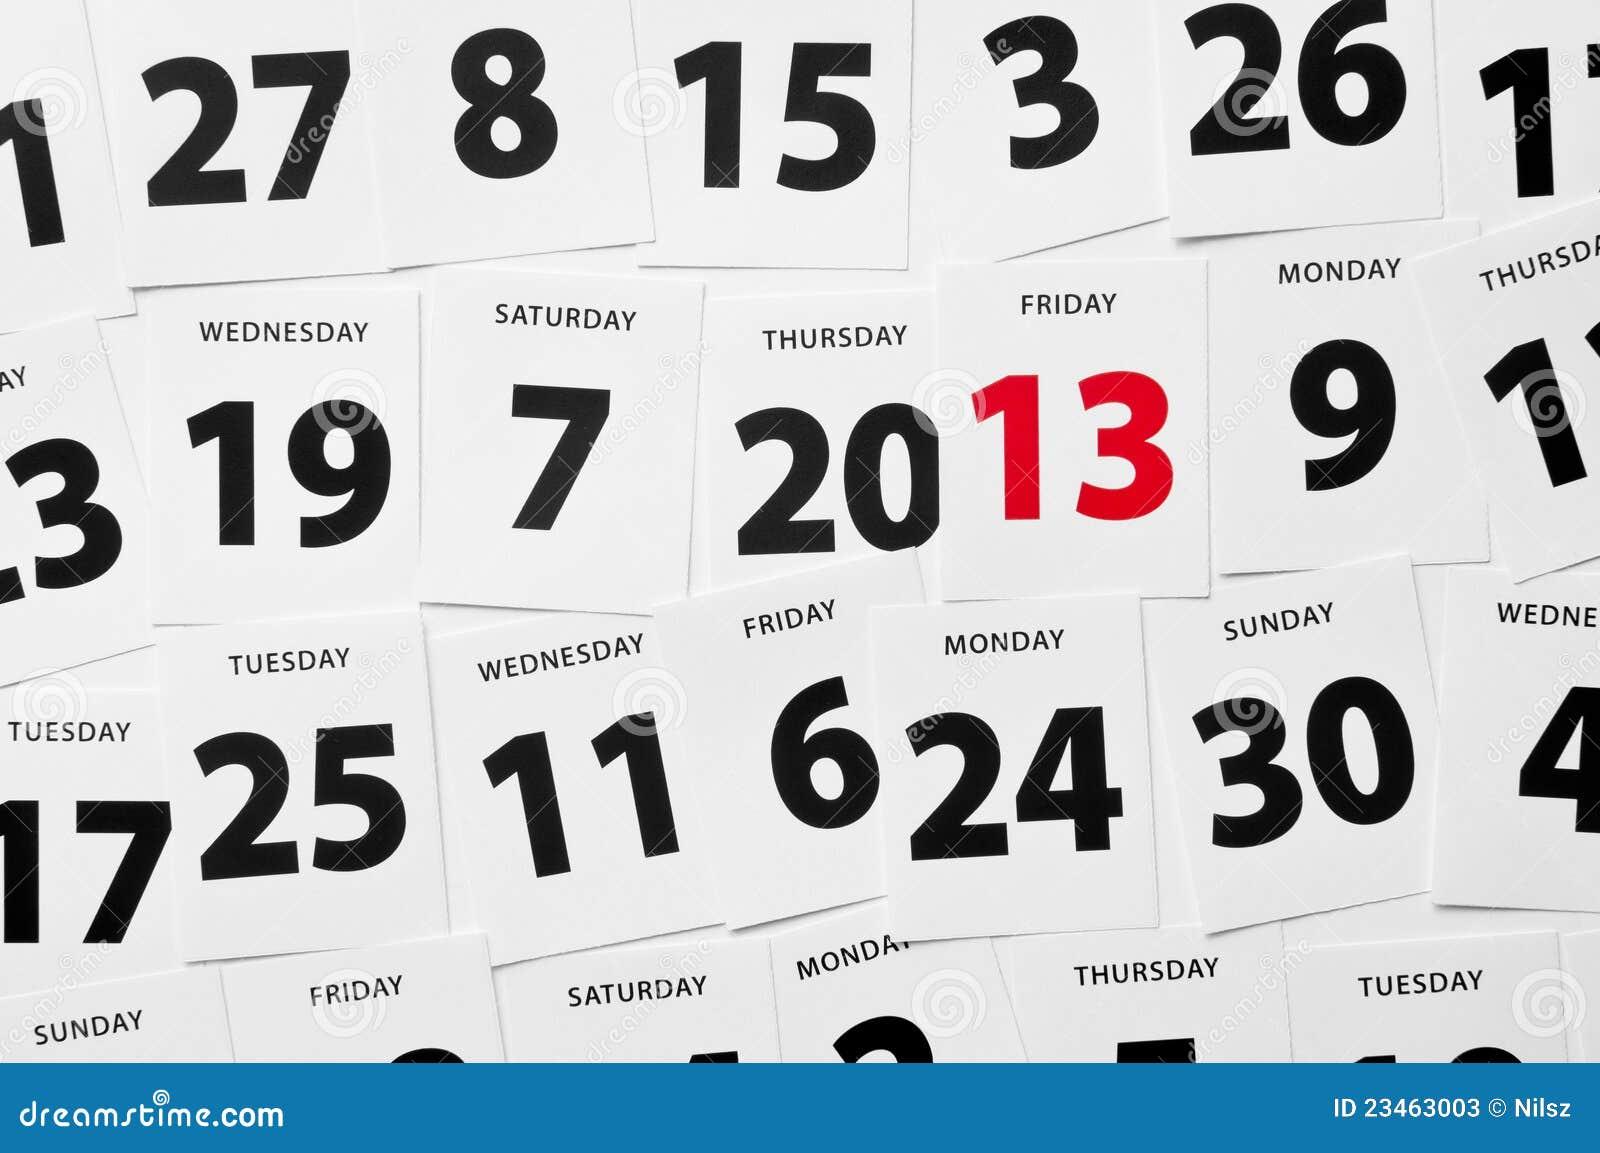 day calendar friday - photo #29